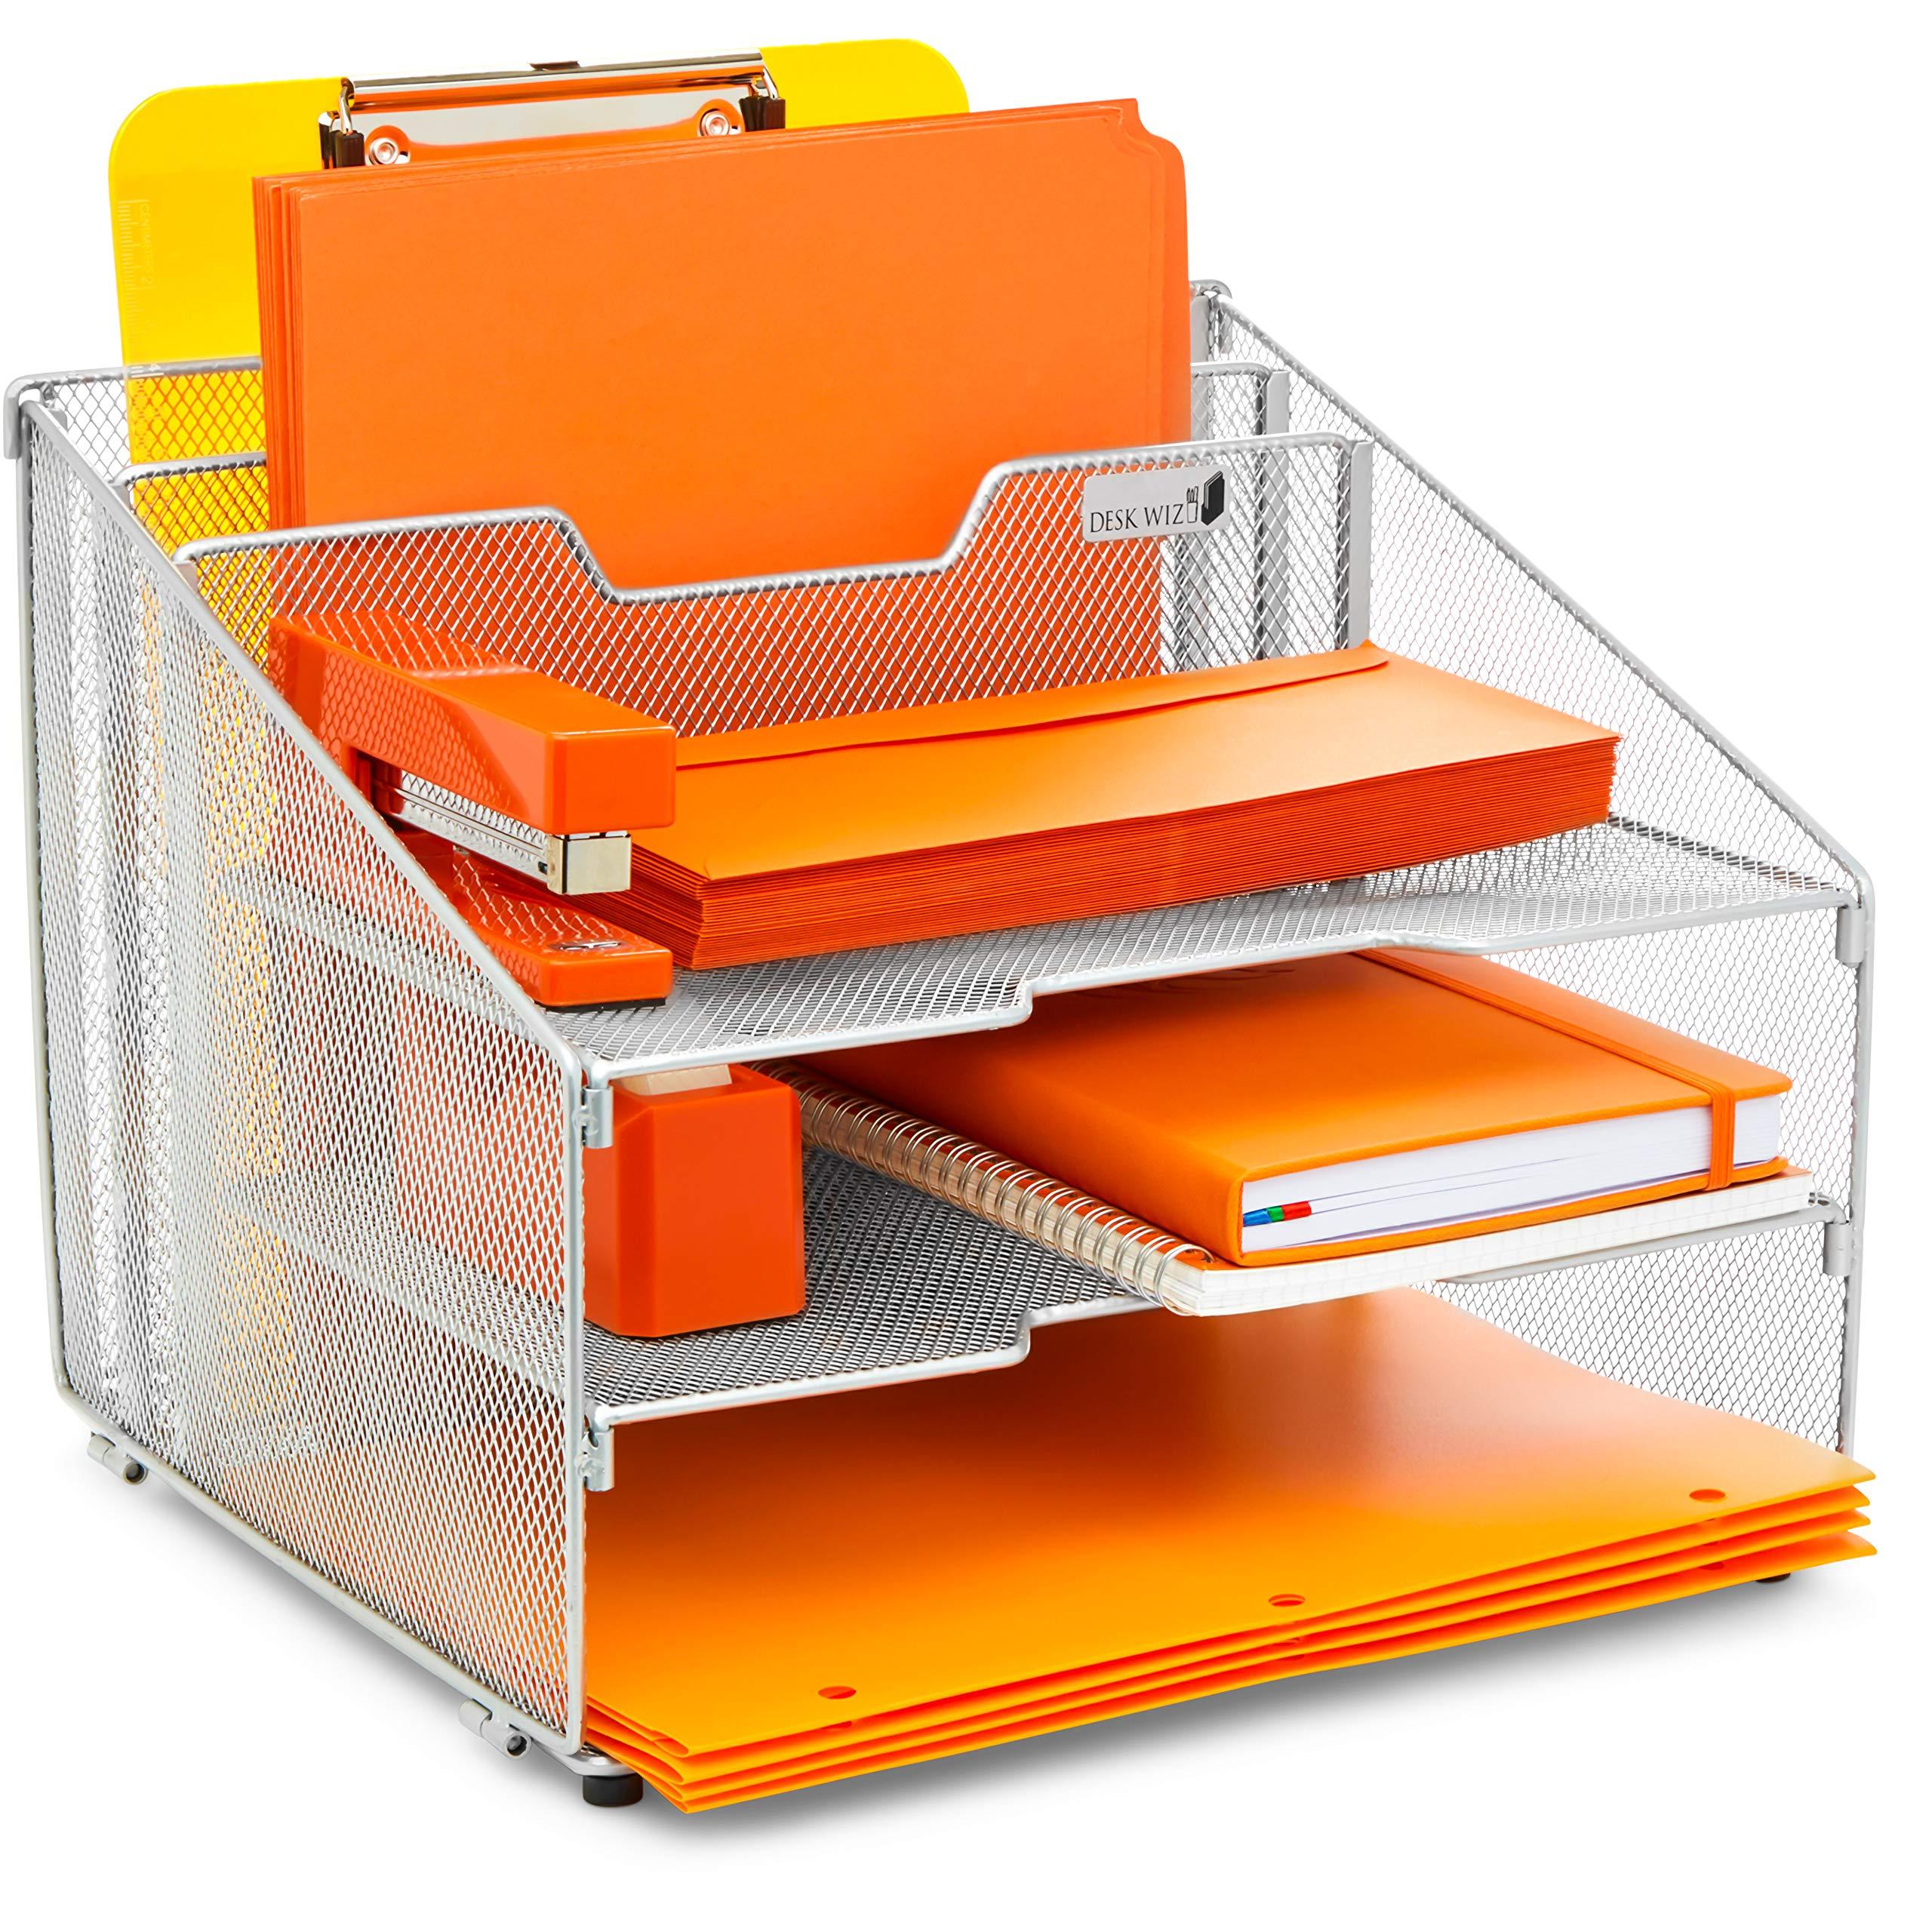 Surprising Desk Wiz Desk Organizer File Folder Holder All In One With Download Free Architecture Designs Scobabritishbridgeorg